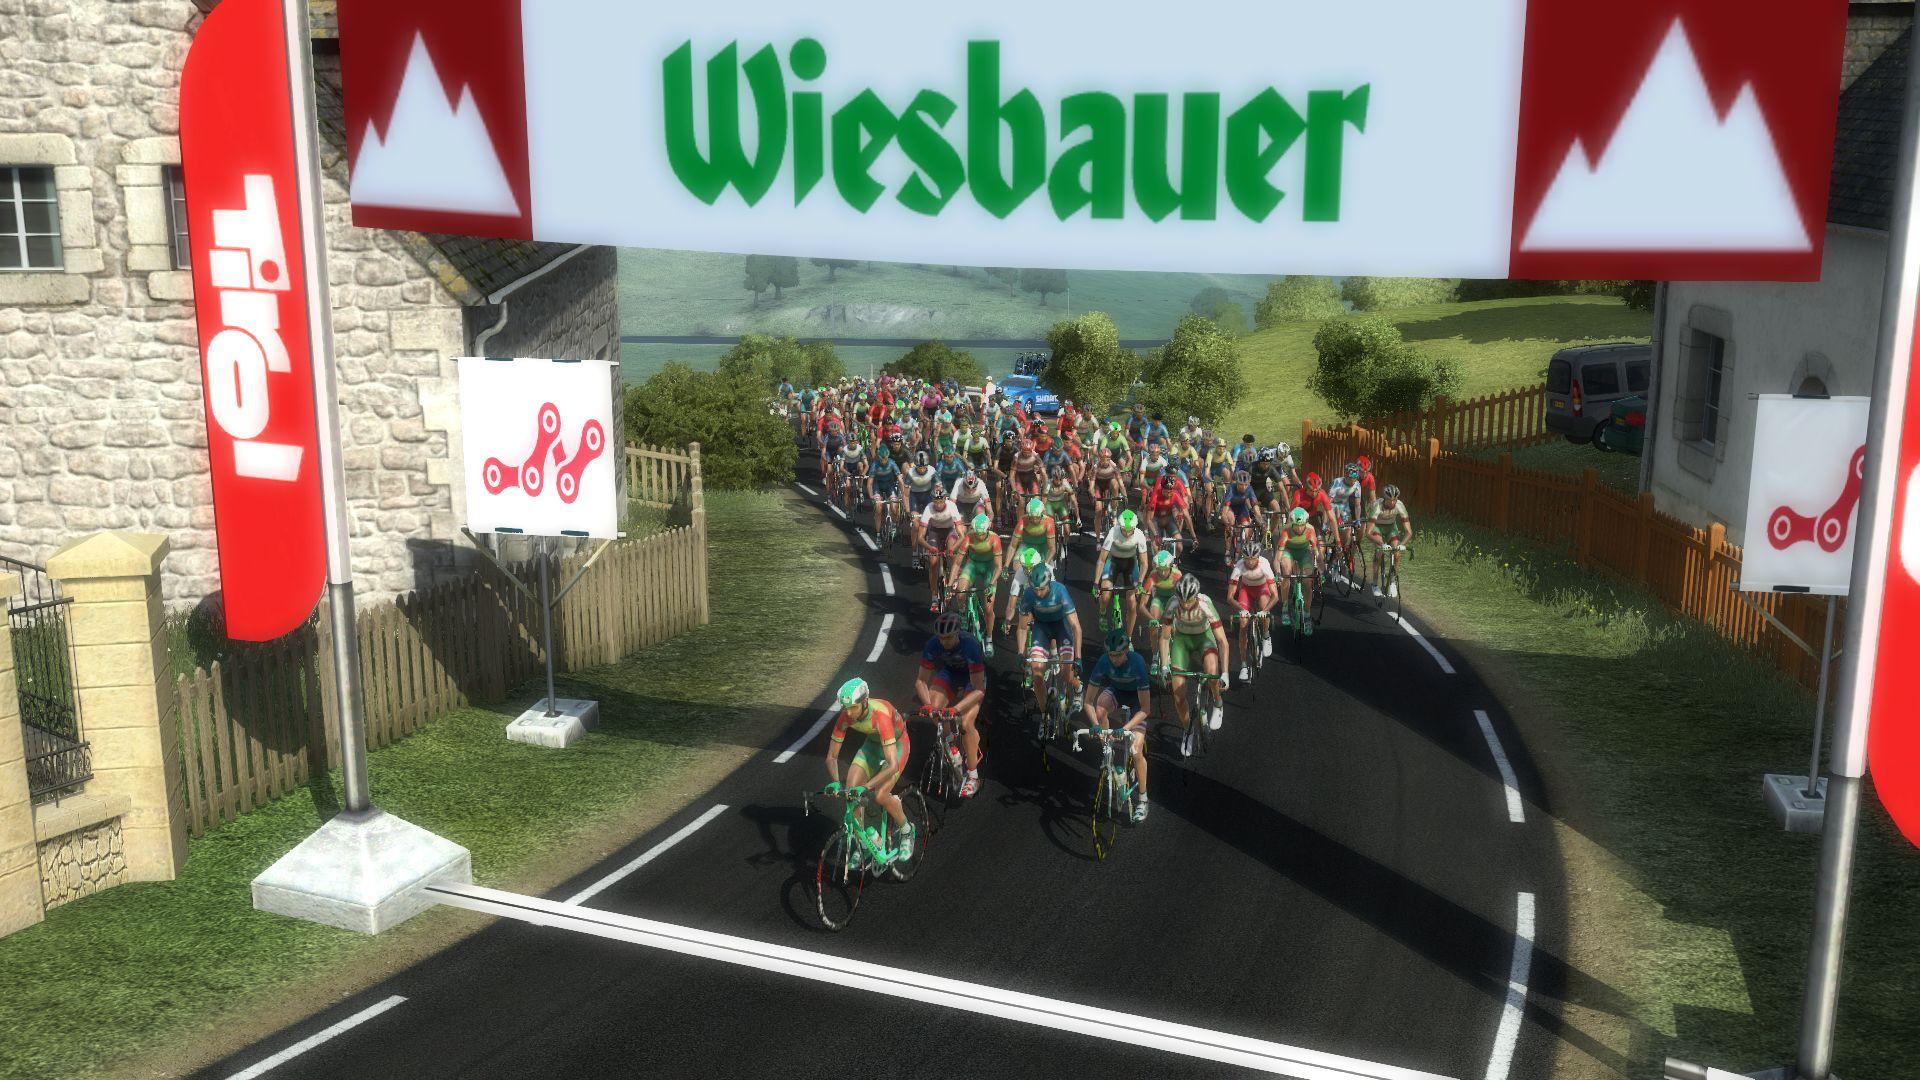 pcmdaily.com/images/mg/2020/Reports/HC/Austria/S1/mg20_austria_s01_32.jpg